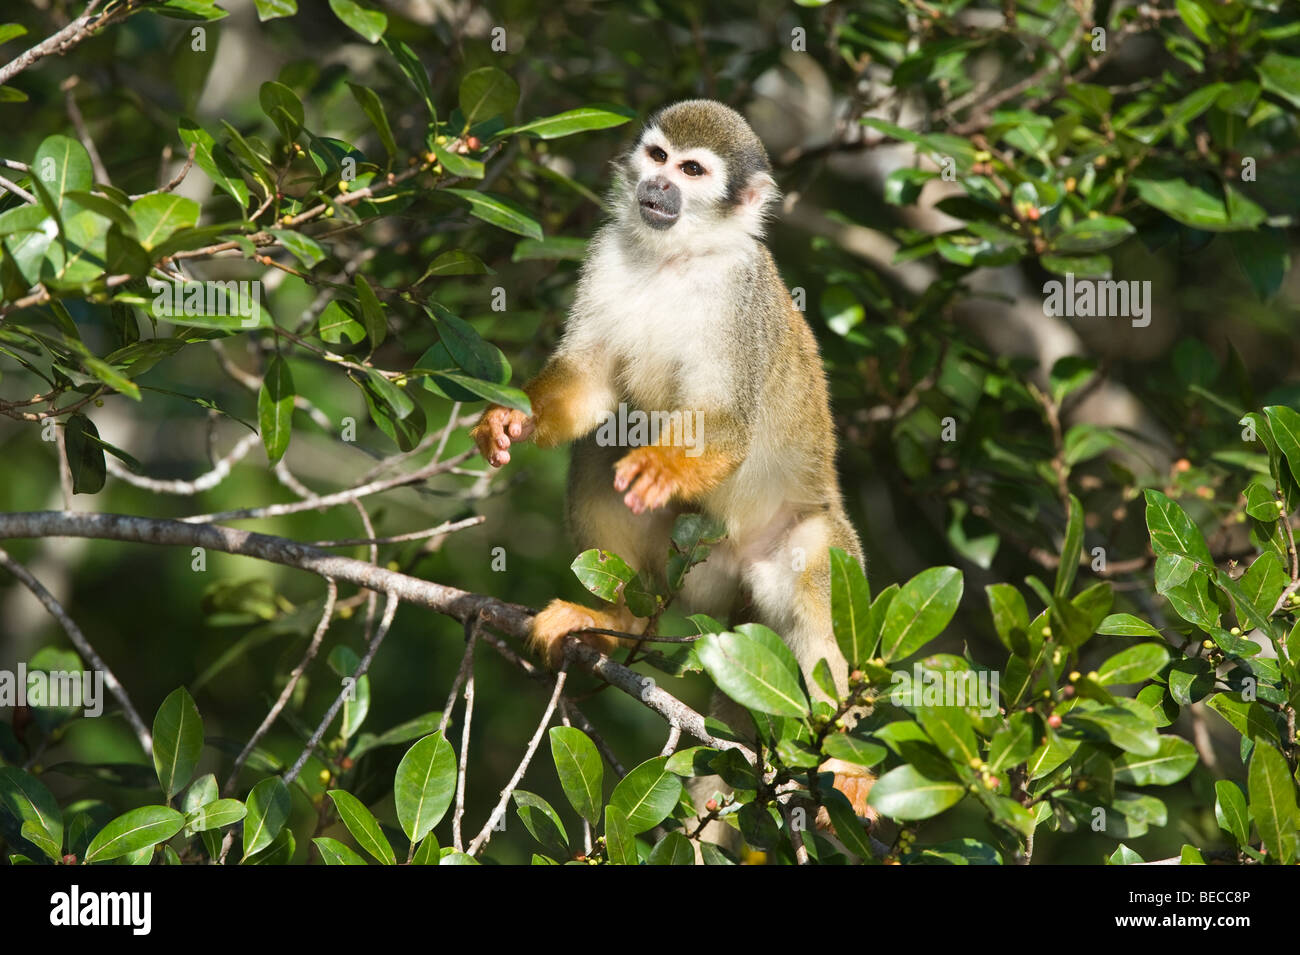 Squirrel monkeys in trees - photo#51